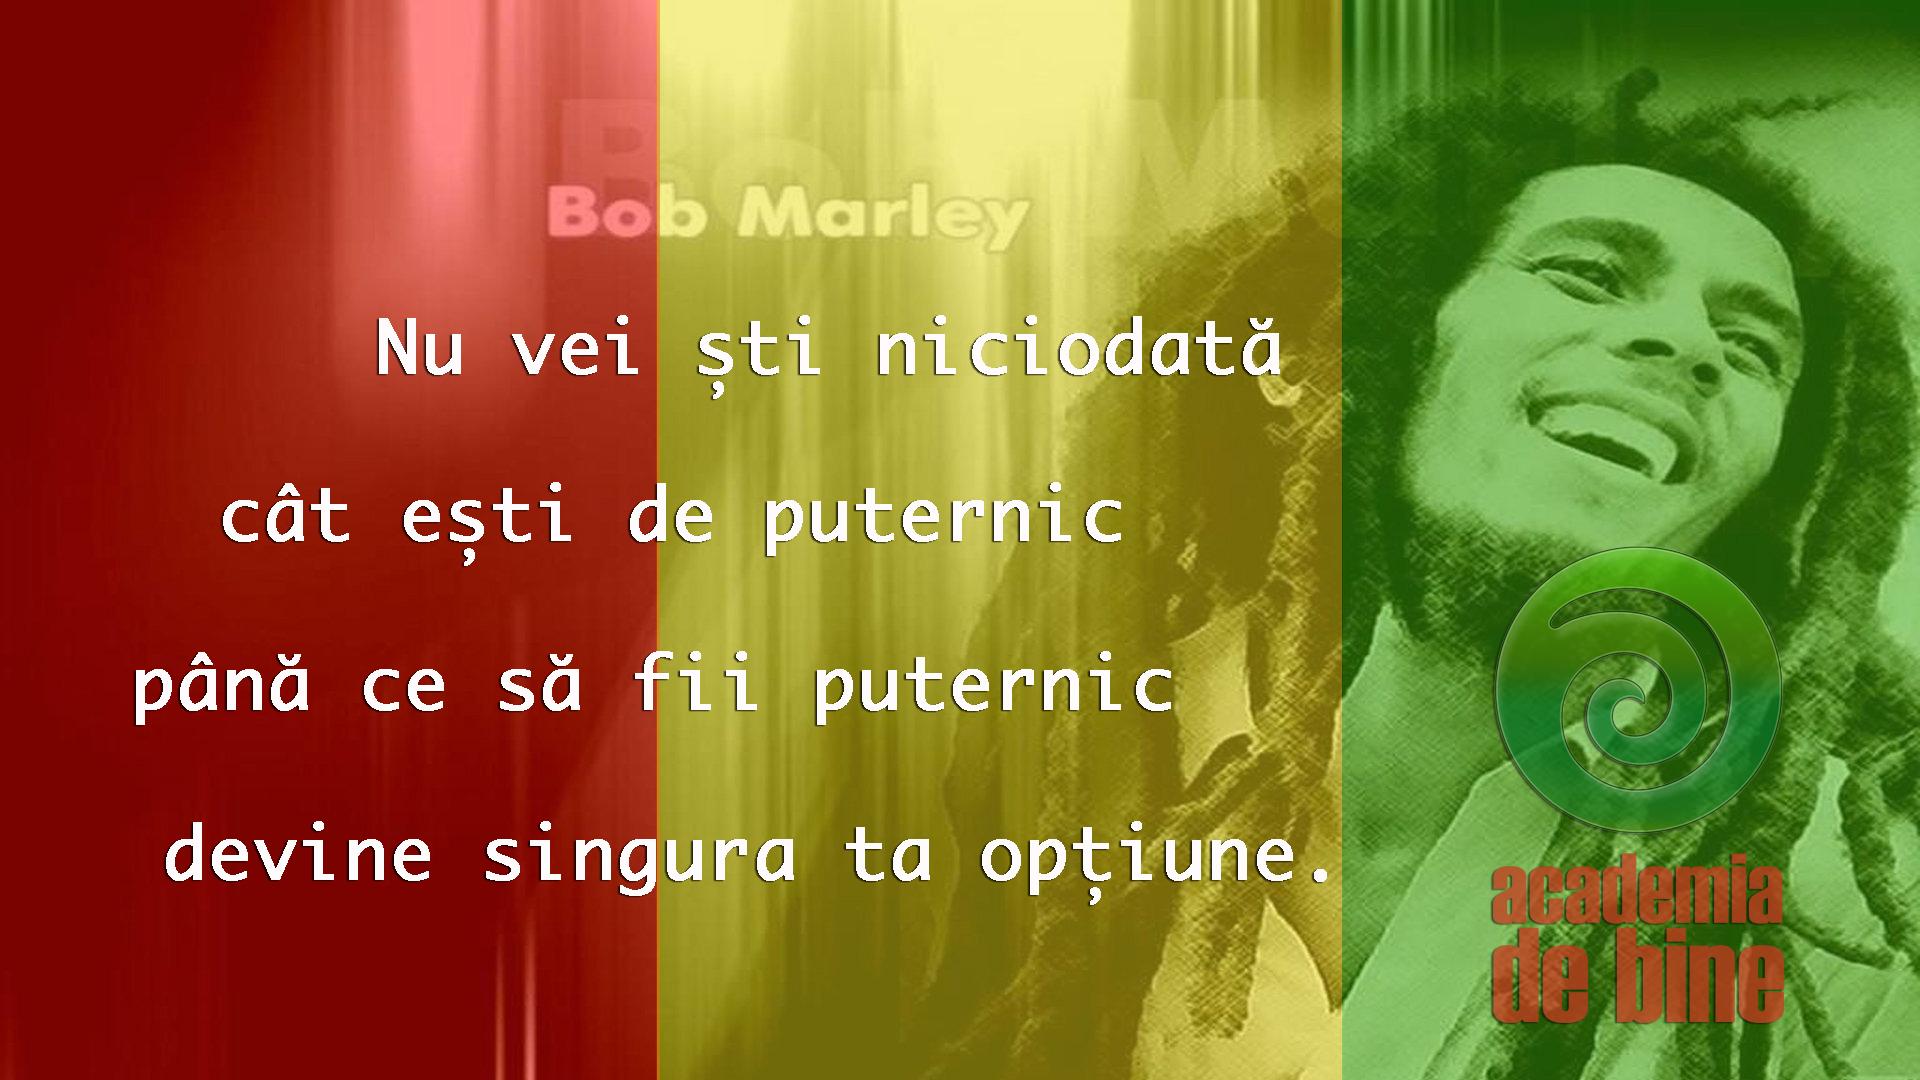 bob marley citate bob marley citate motivationale bob marley citate